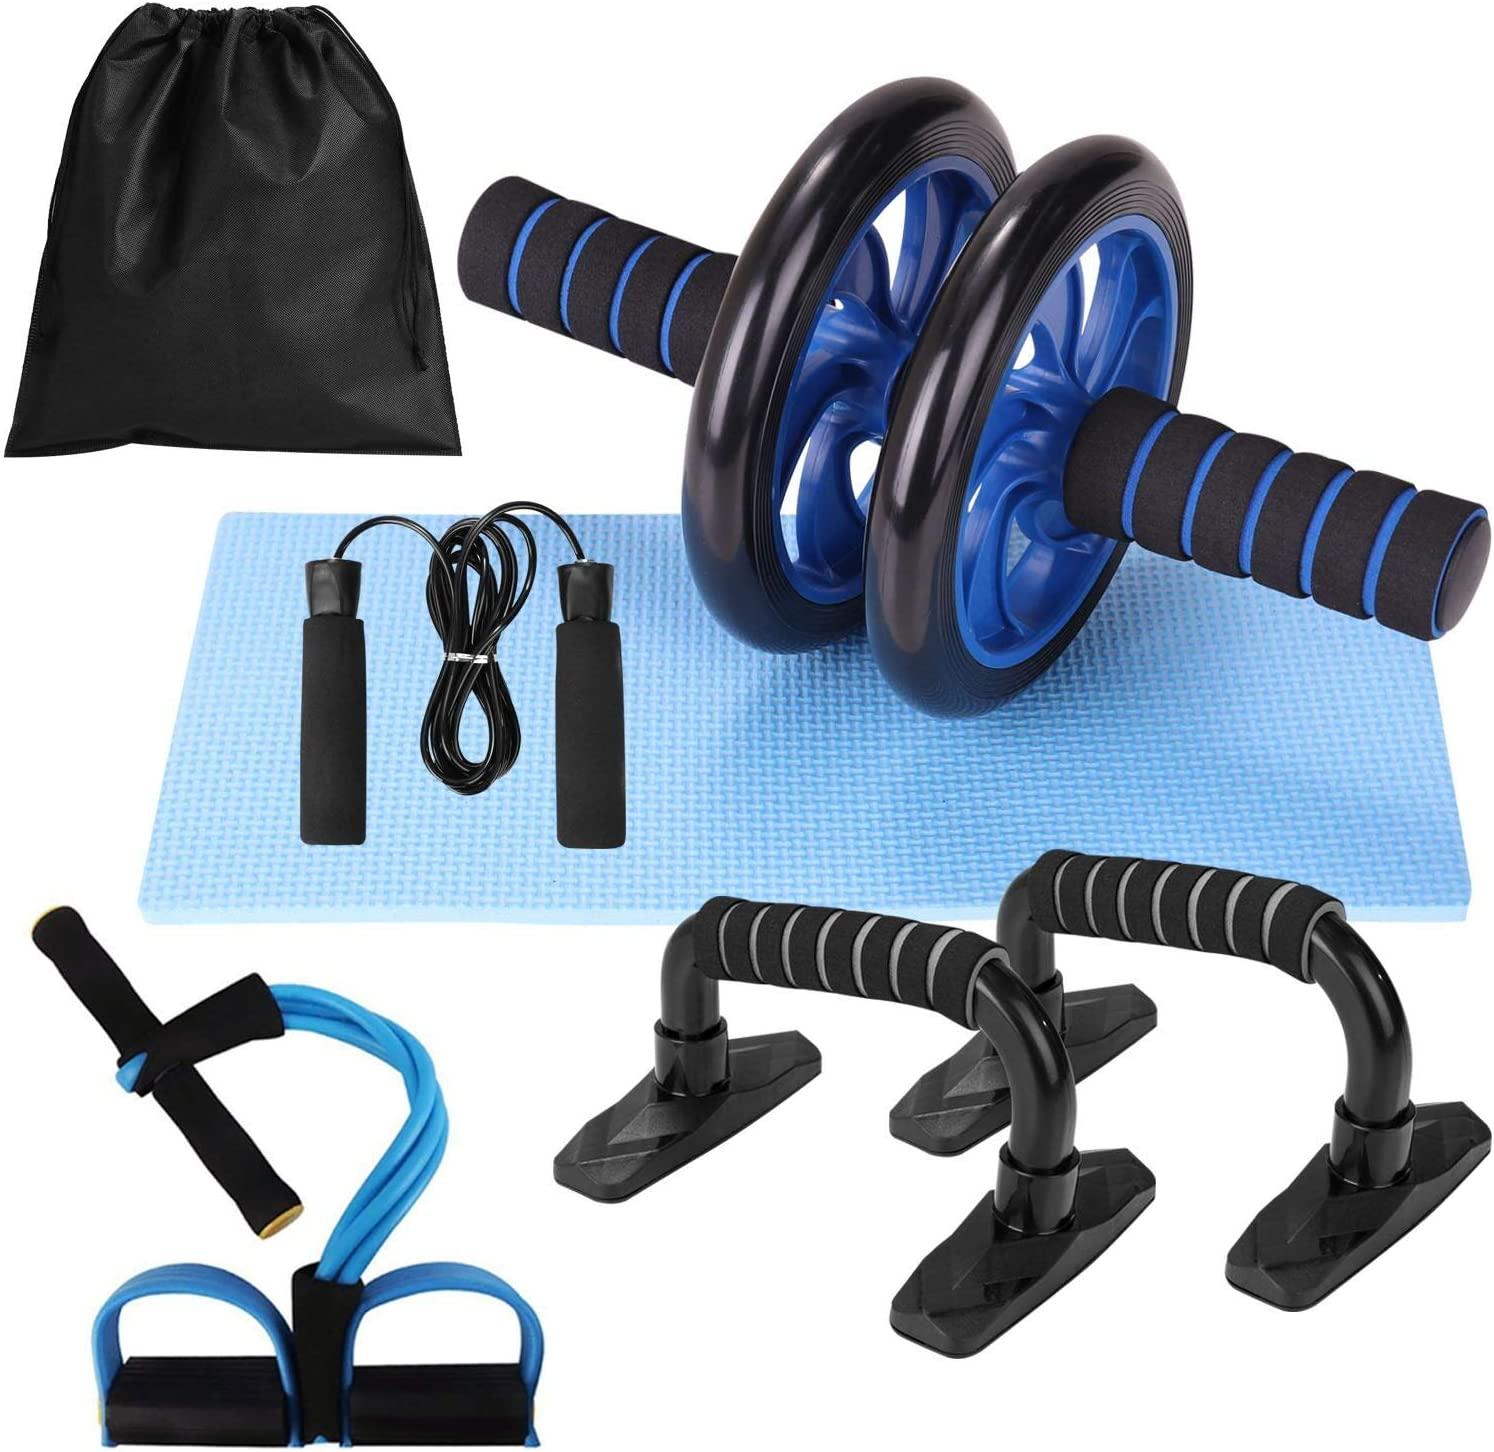 Kit rueda abdominal 5 en 1